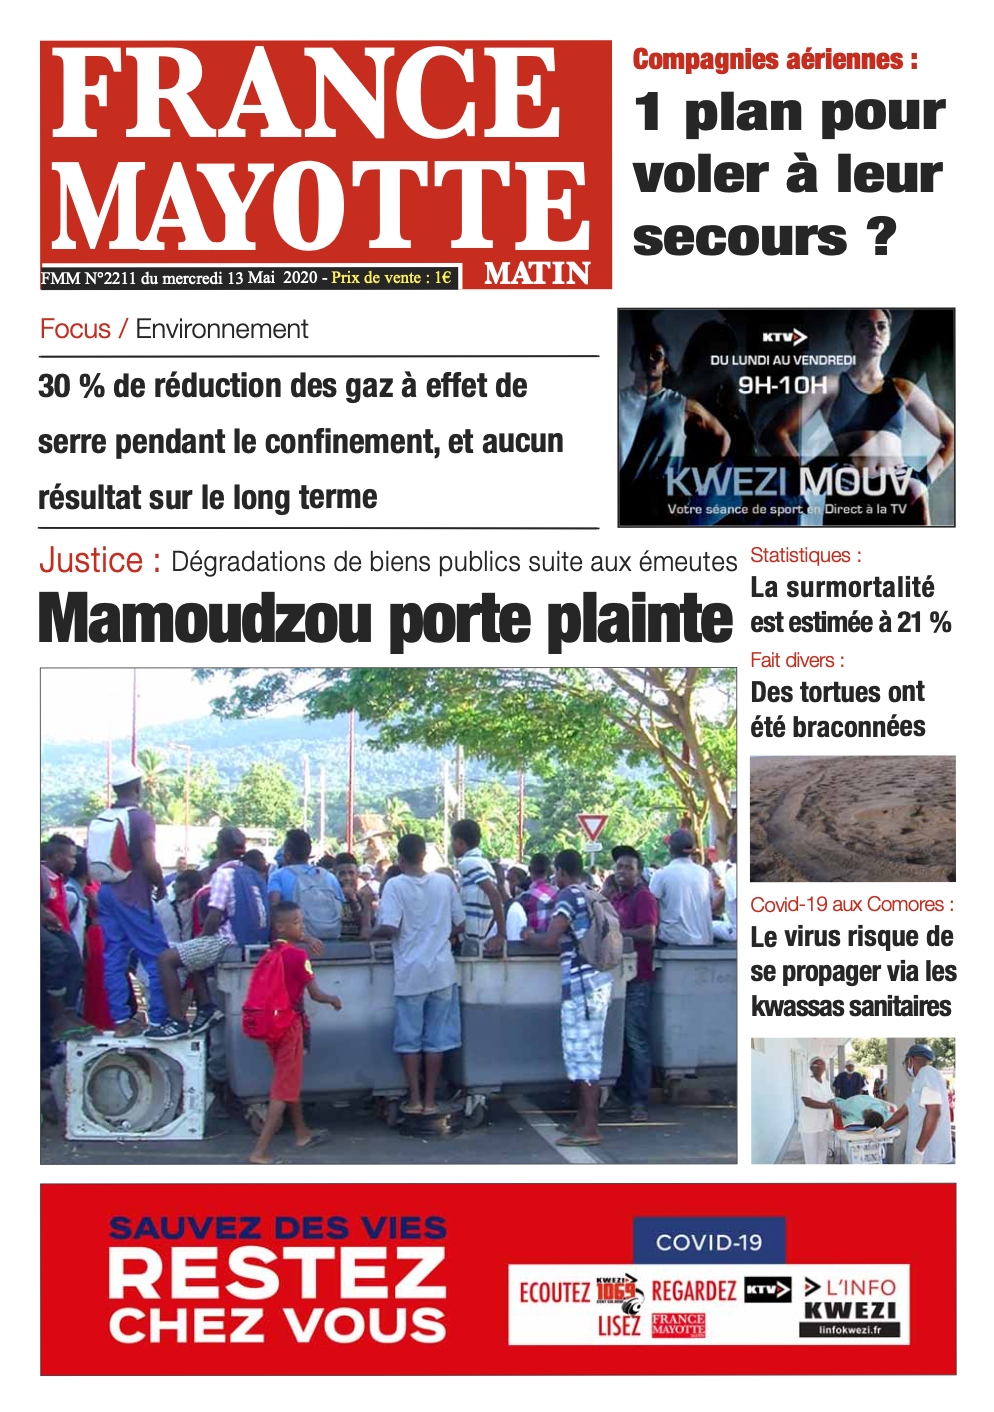 France Mayotte Mercredi 13 mai 2020